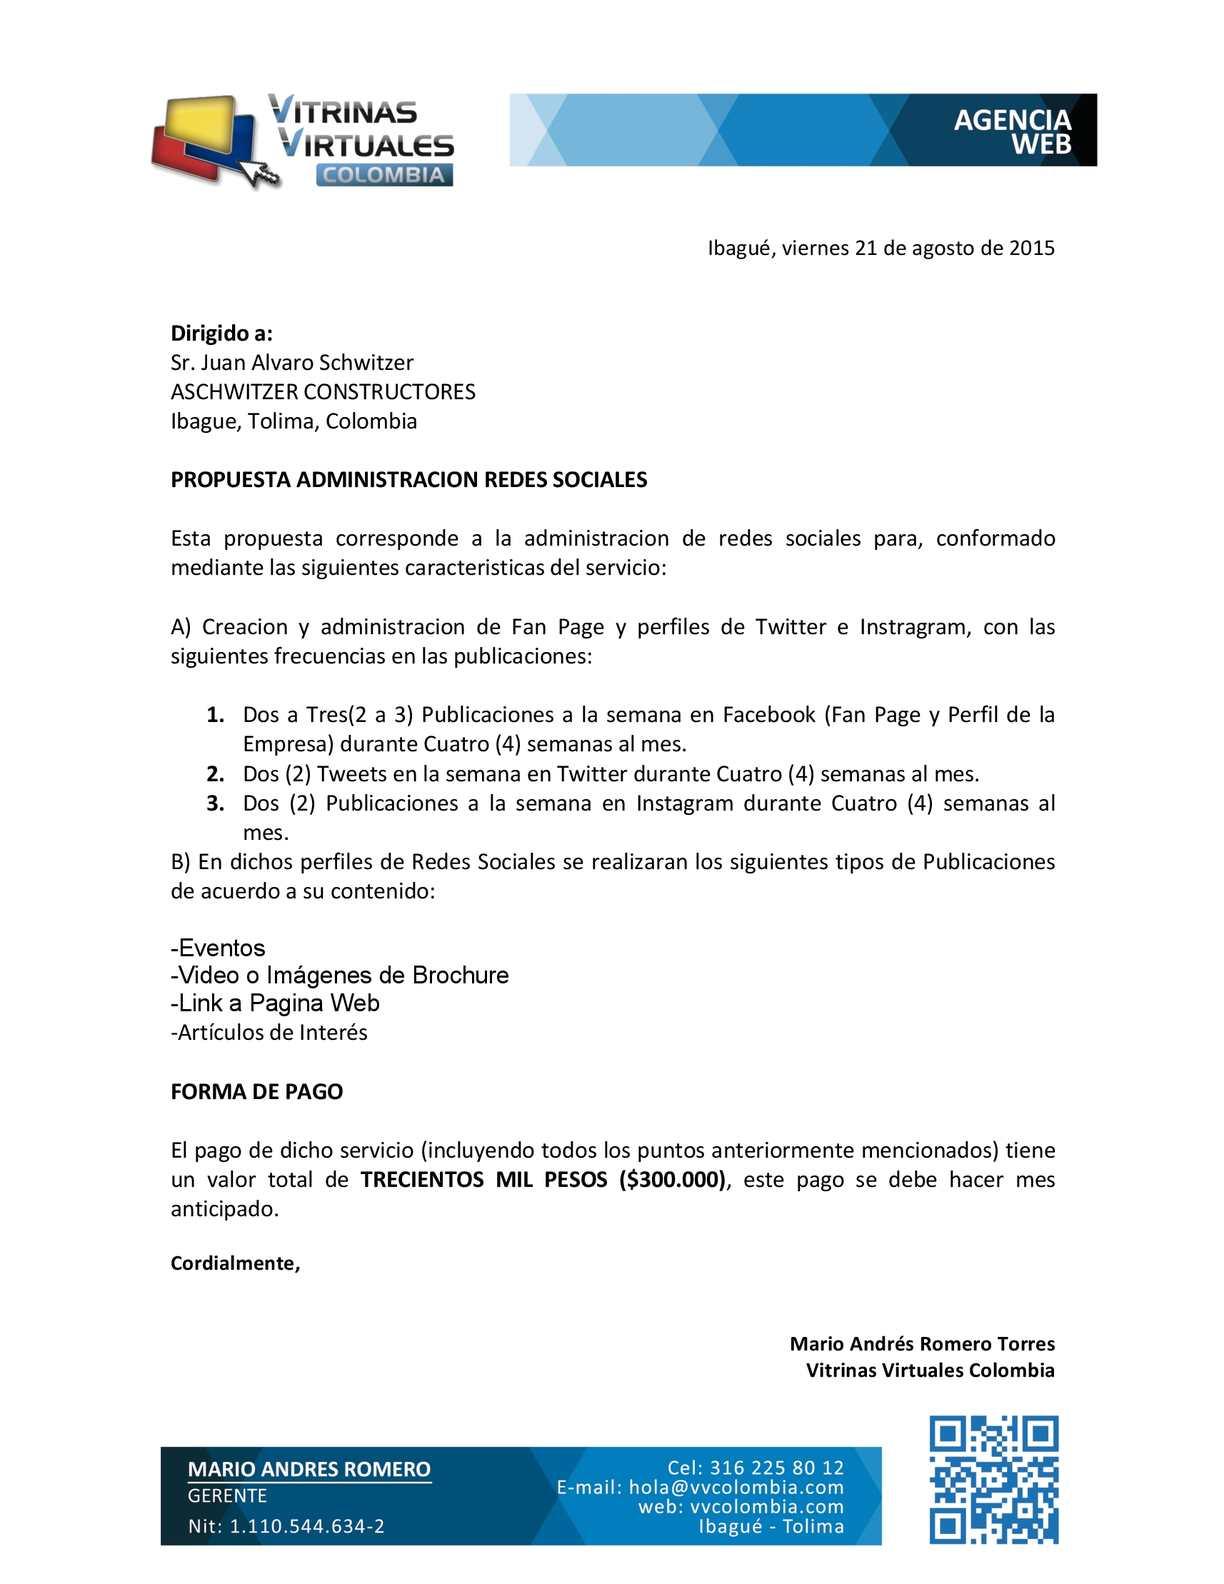 Propuesta Manejo Redes Sociales Para Aschwitzer